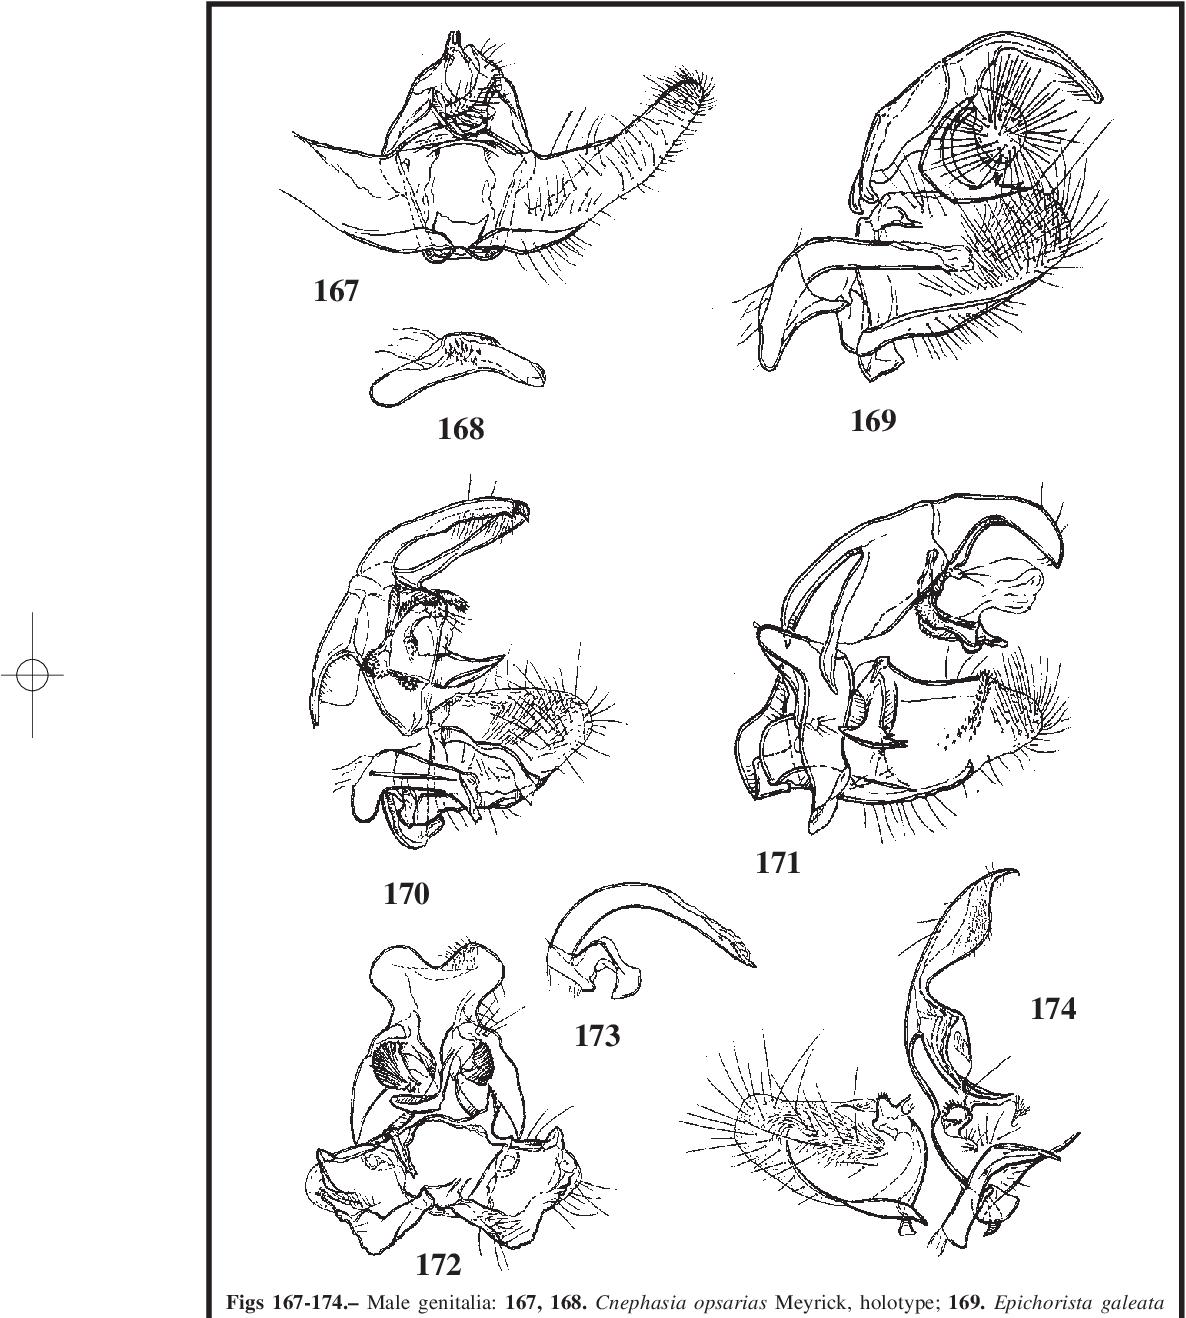 figure 167-174